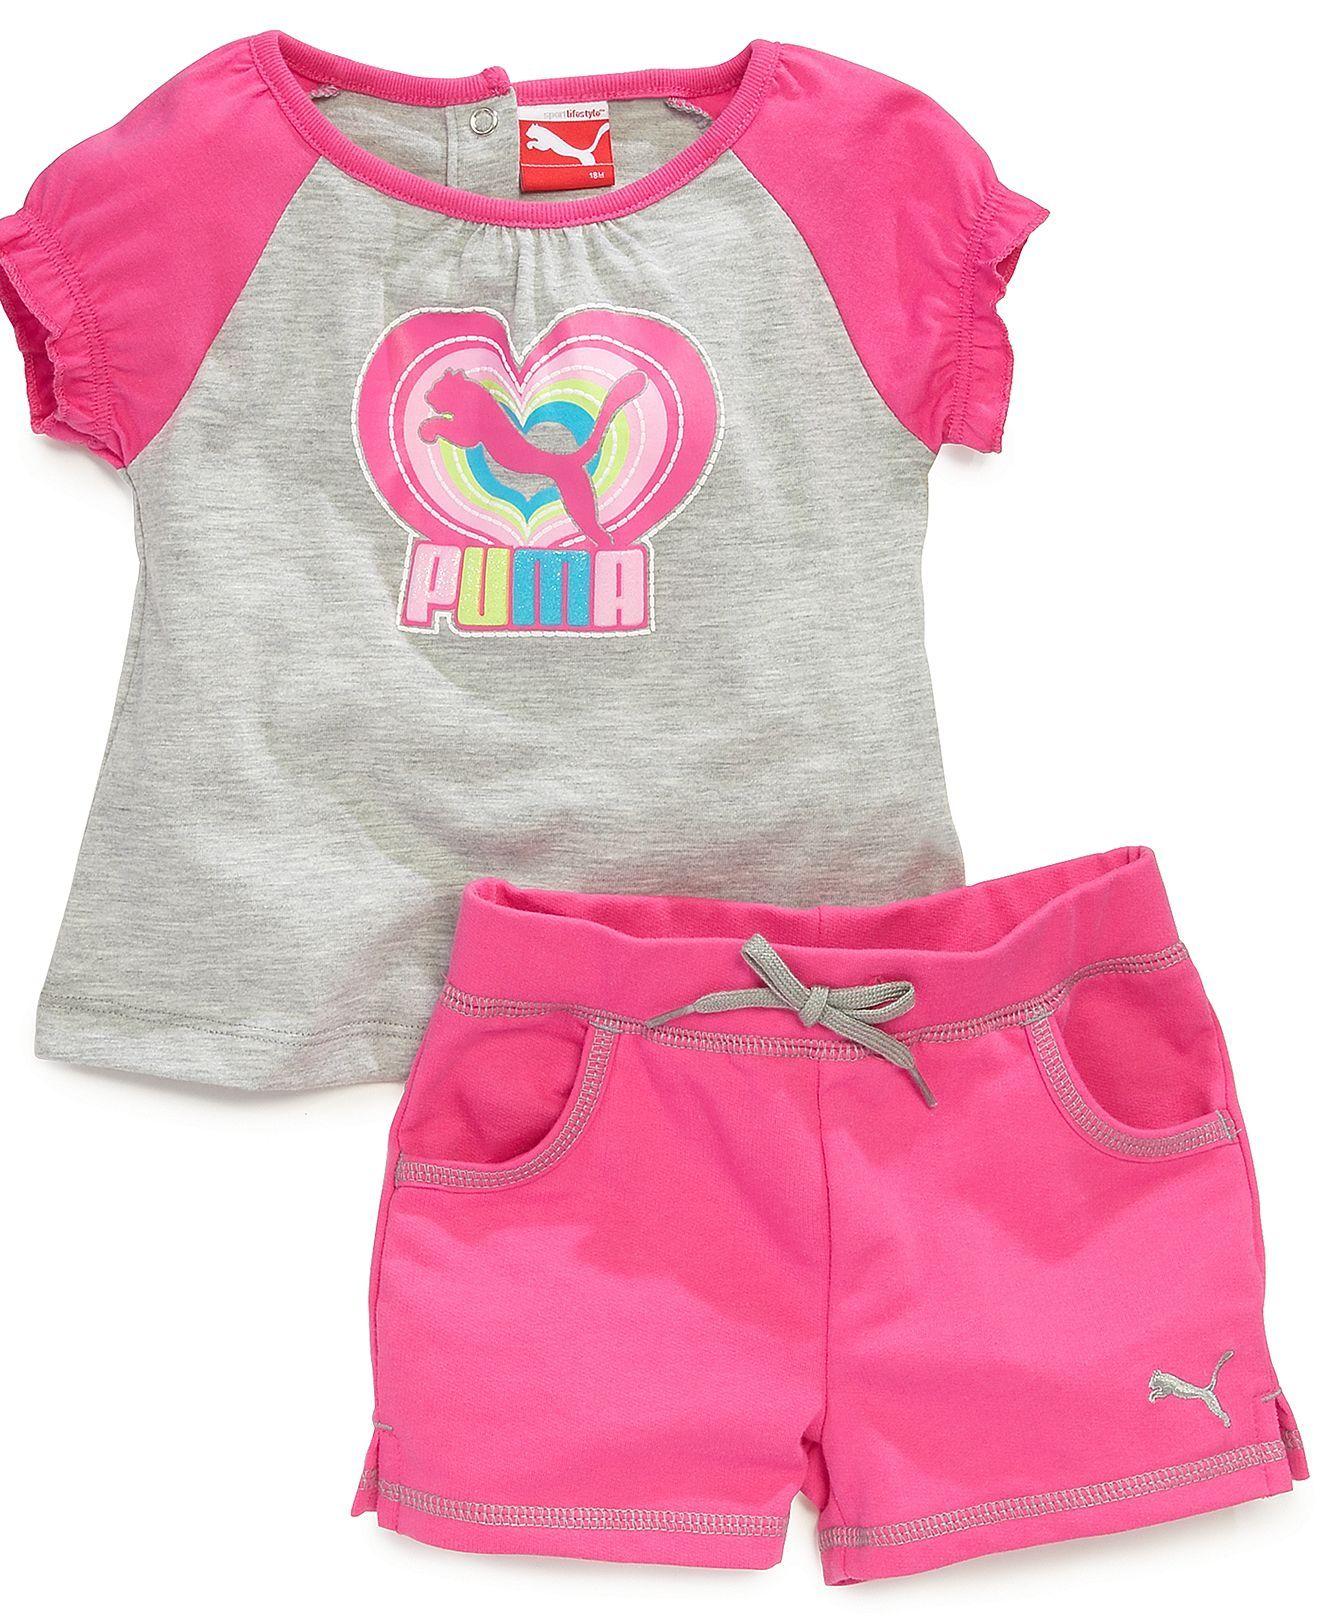 Puma Baby Girls 2 Piece Shirt & Shorts Set Kids & Baby Macy s